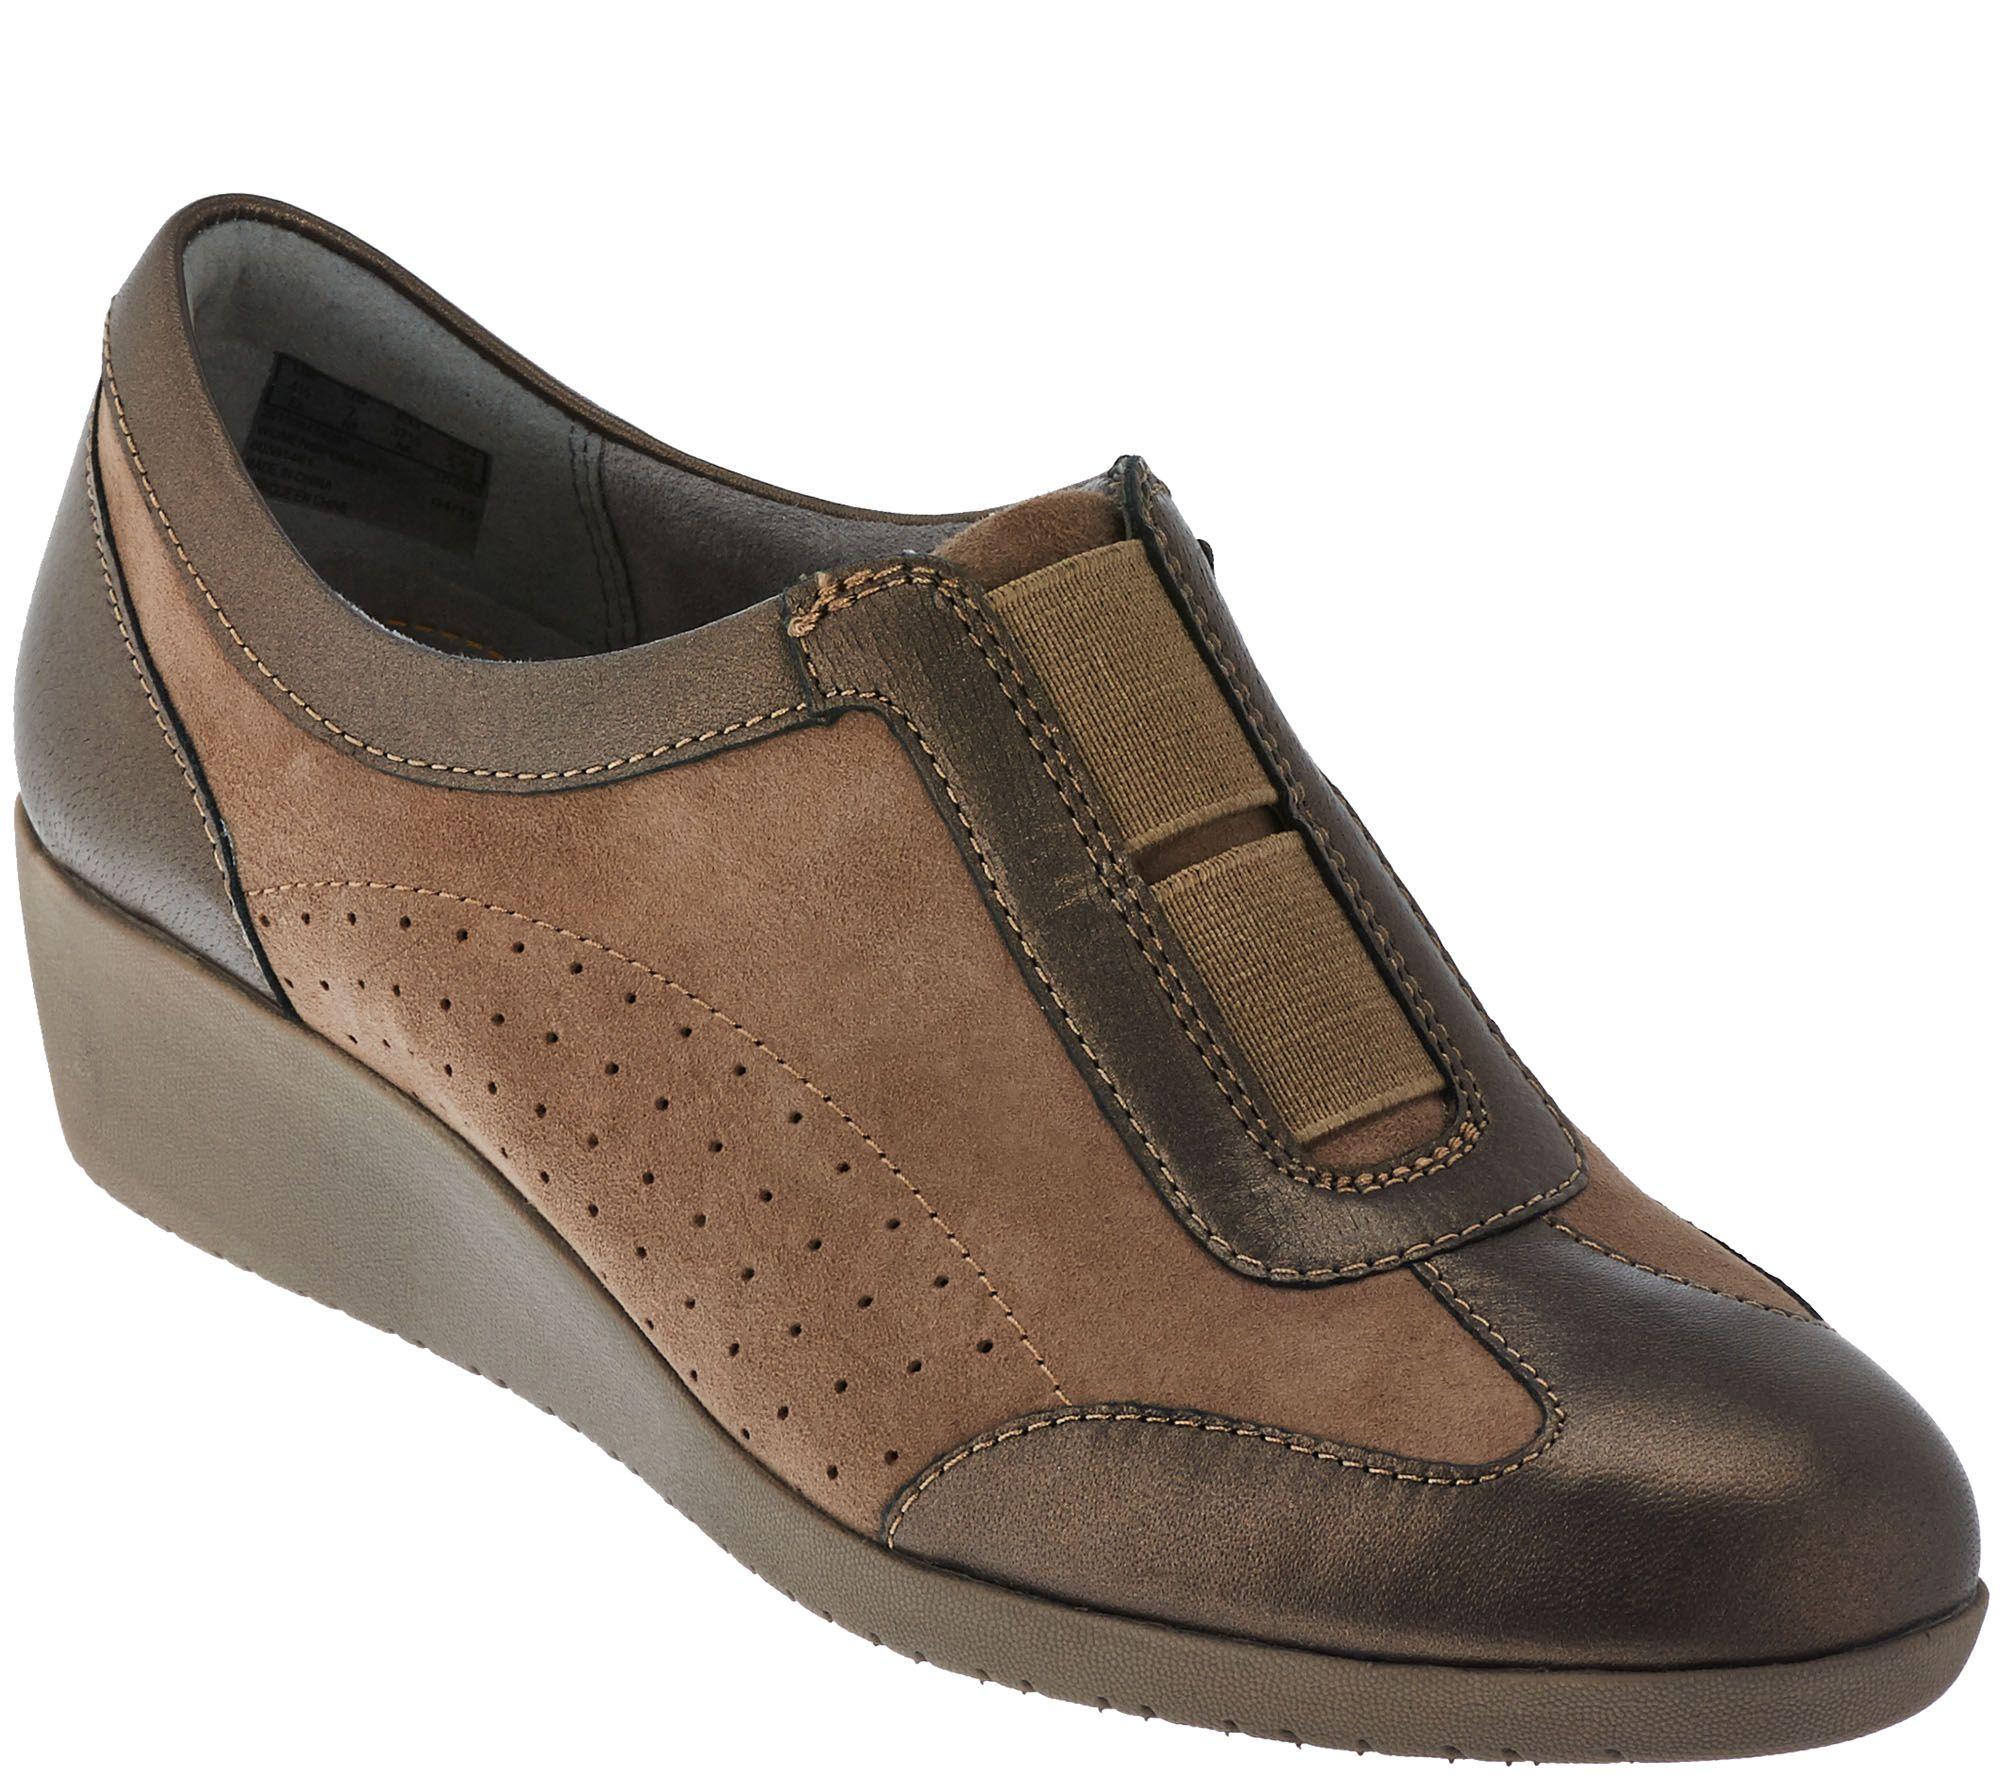 high sandal s hi wedge res most comforter tan brash light womens sabrina women wedges comfortable payless